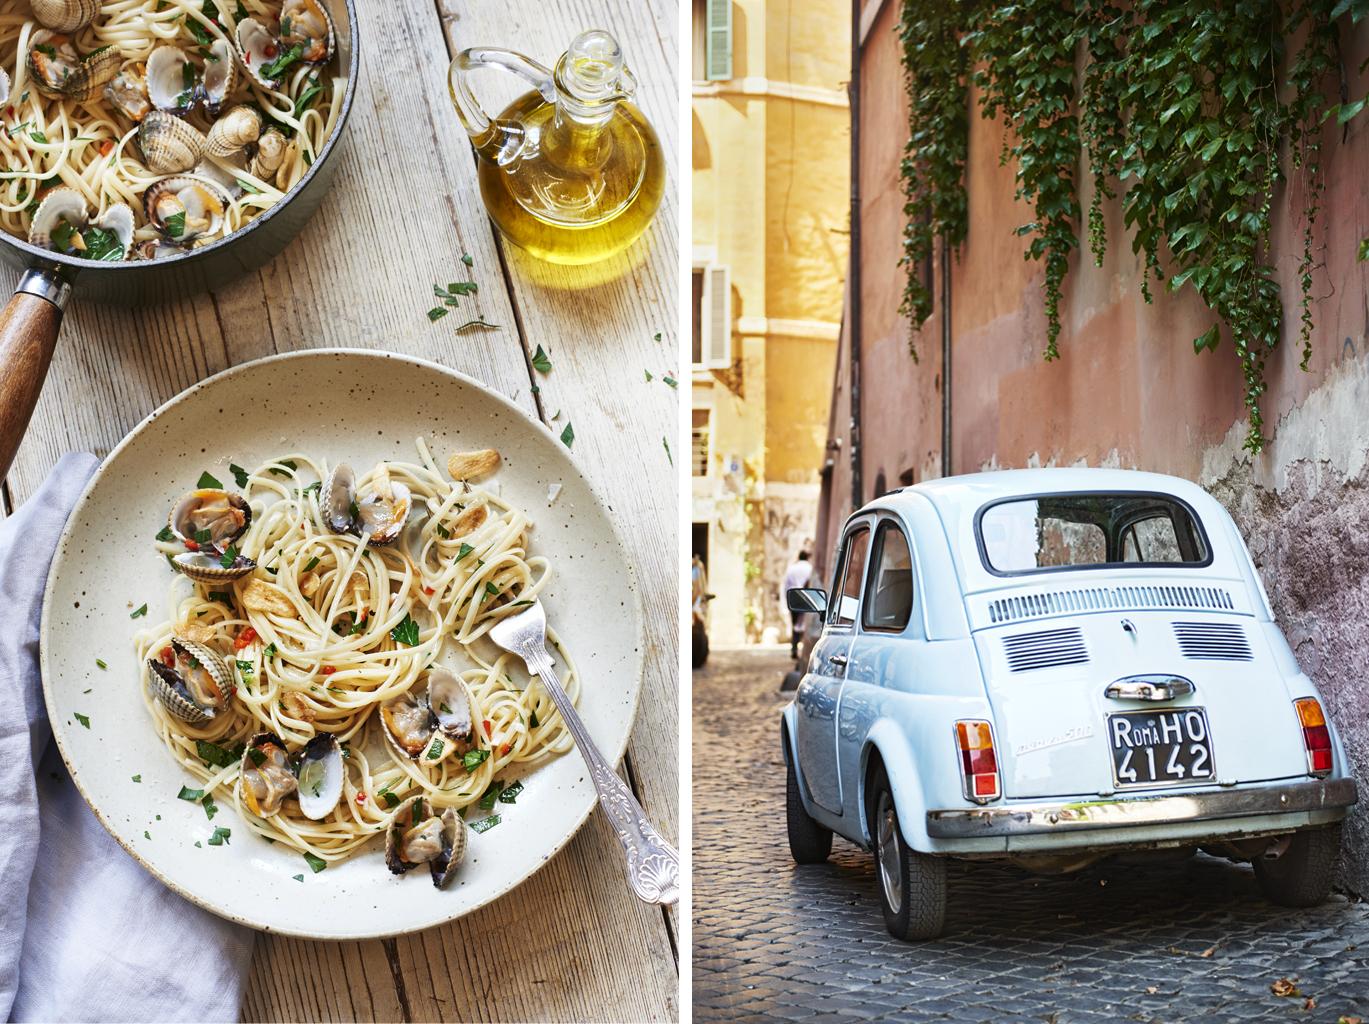 Italy: Spaghetti Vongole, Fiat Panda: Roma.